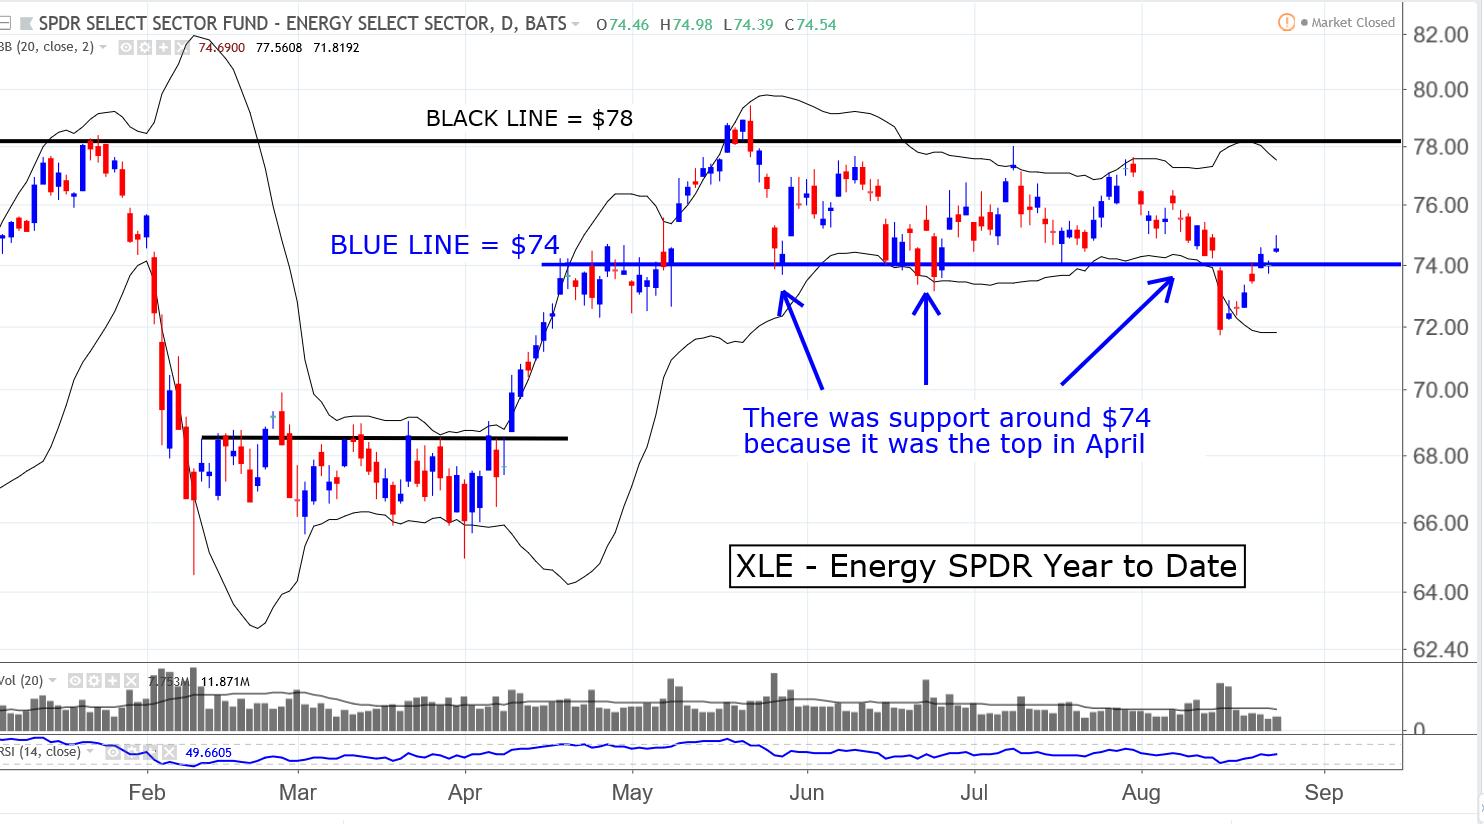 XLE S&P 500 Energy Sector SPDR etf